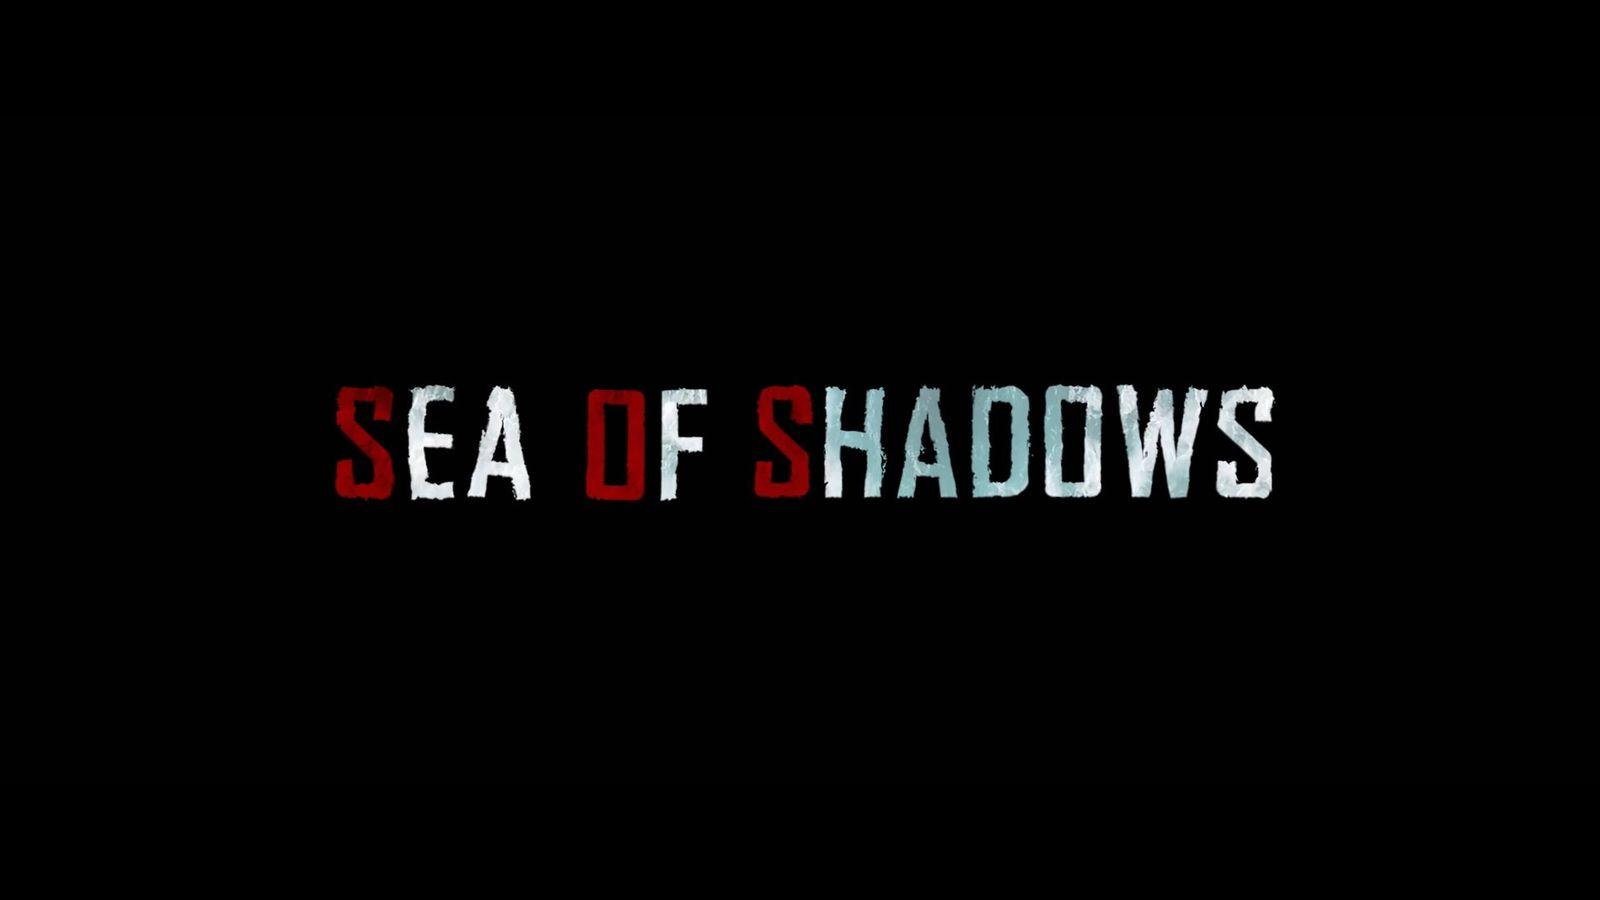 SEA OF SHADOWS - DIMANCHE 24 NOV À 20:40